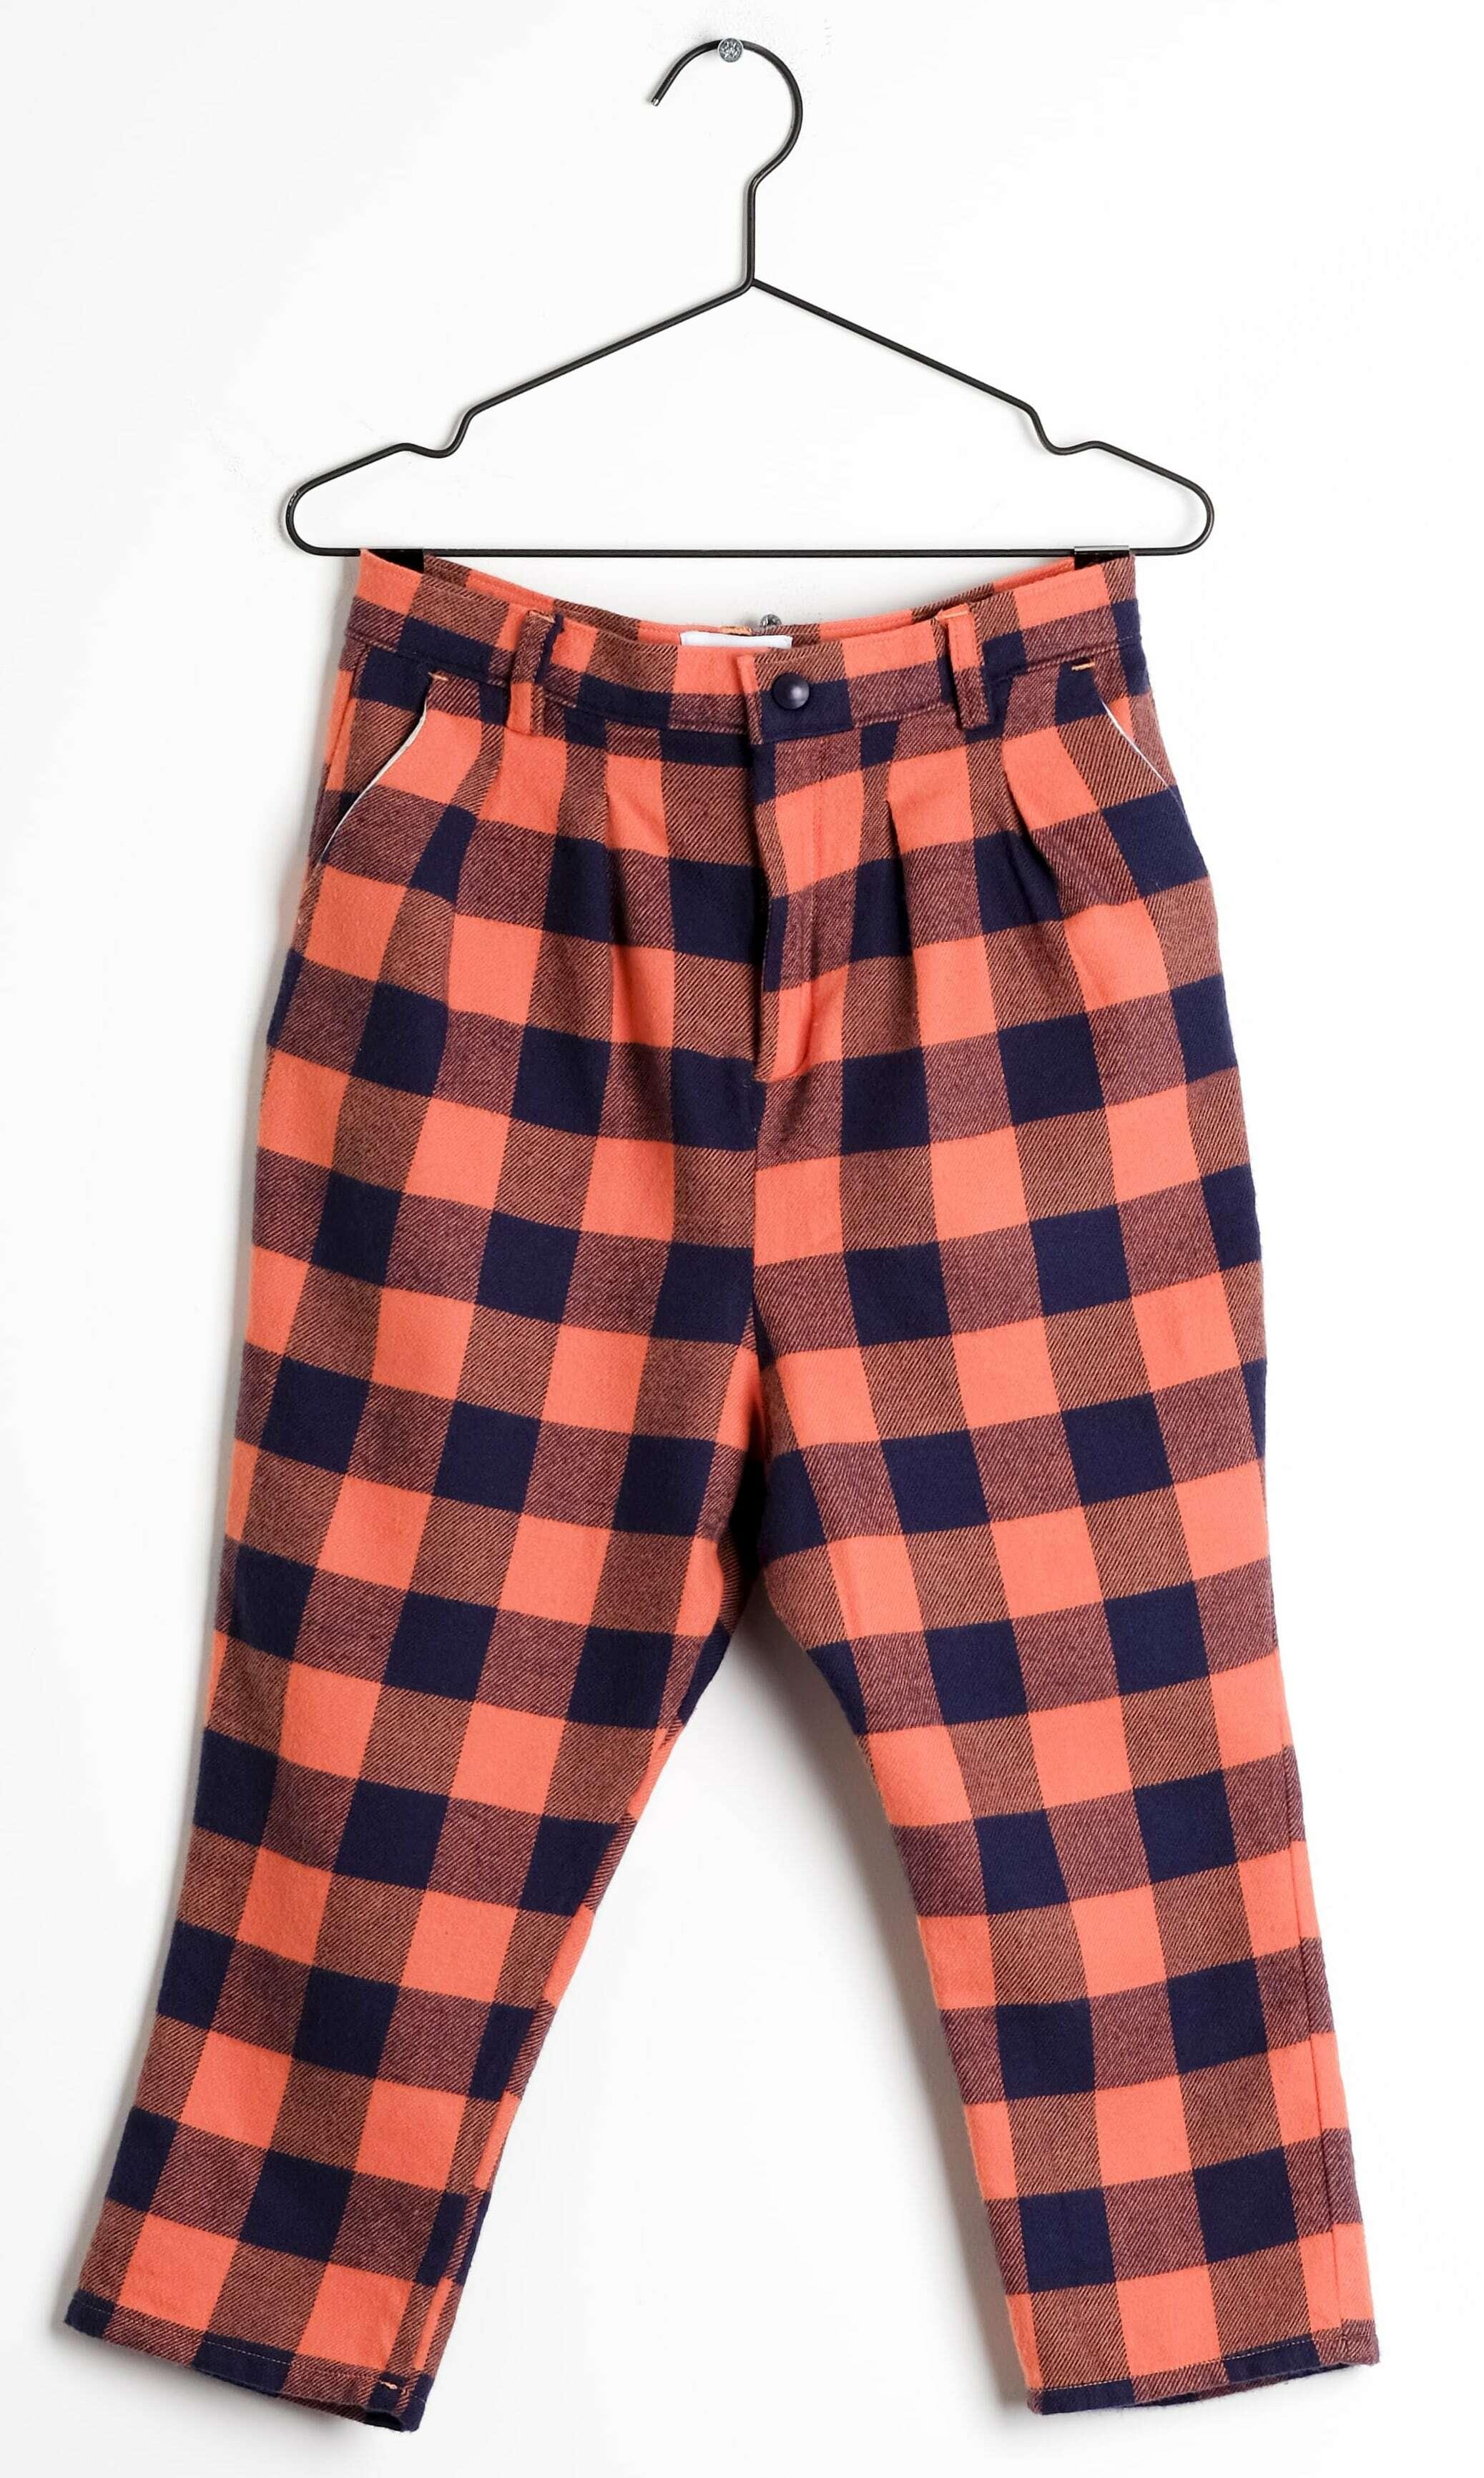 《WOLF & RITA 2019AW》ANDRE trousers / Xadrez